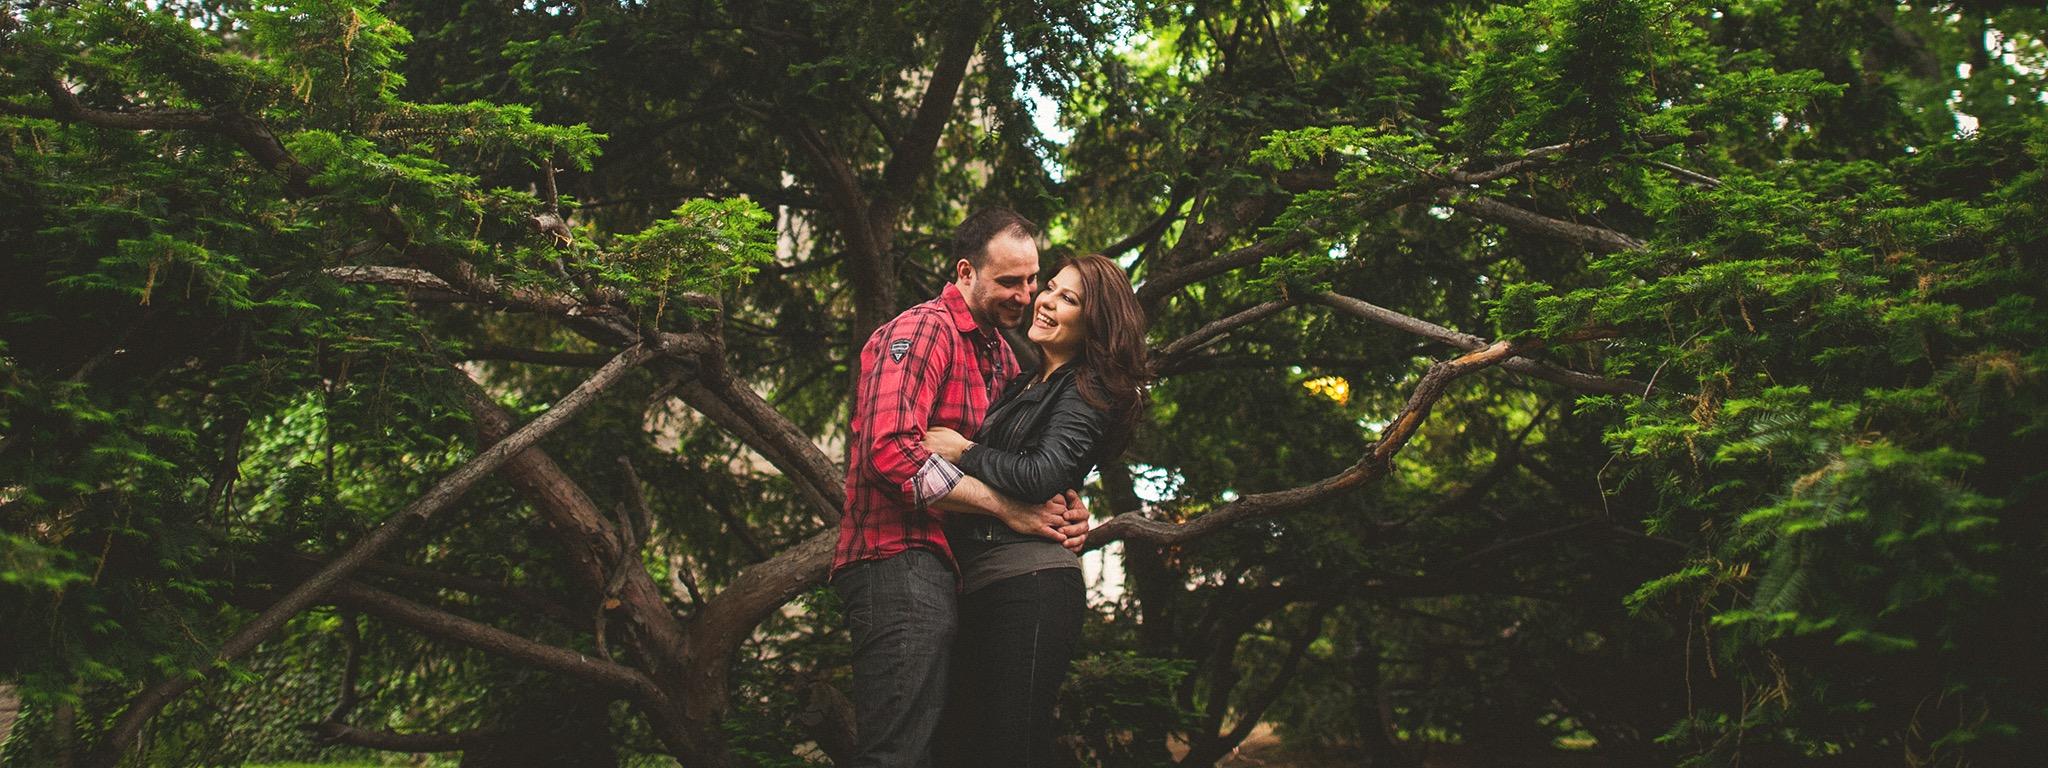 23-couple-in-tree.jpg